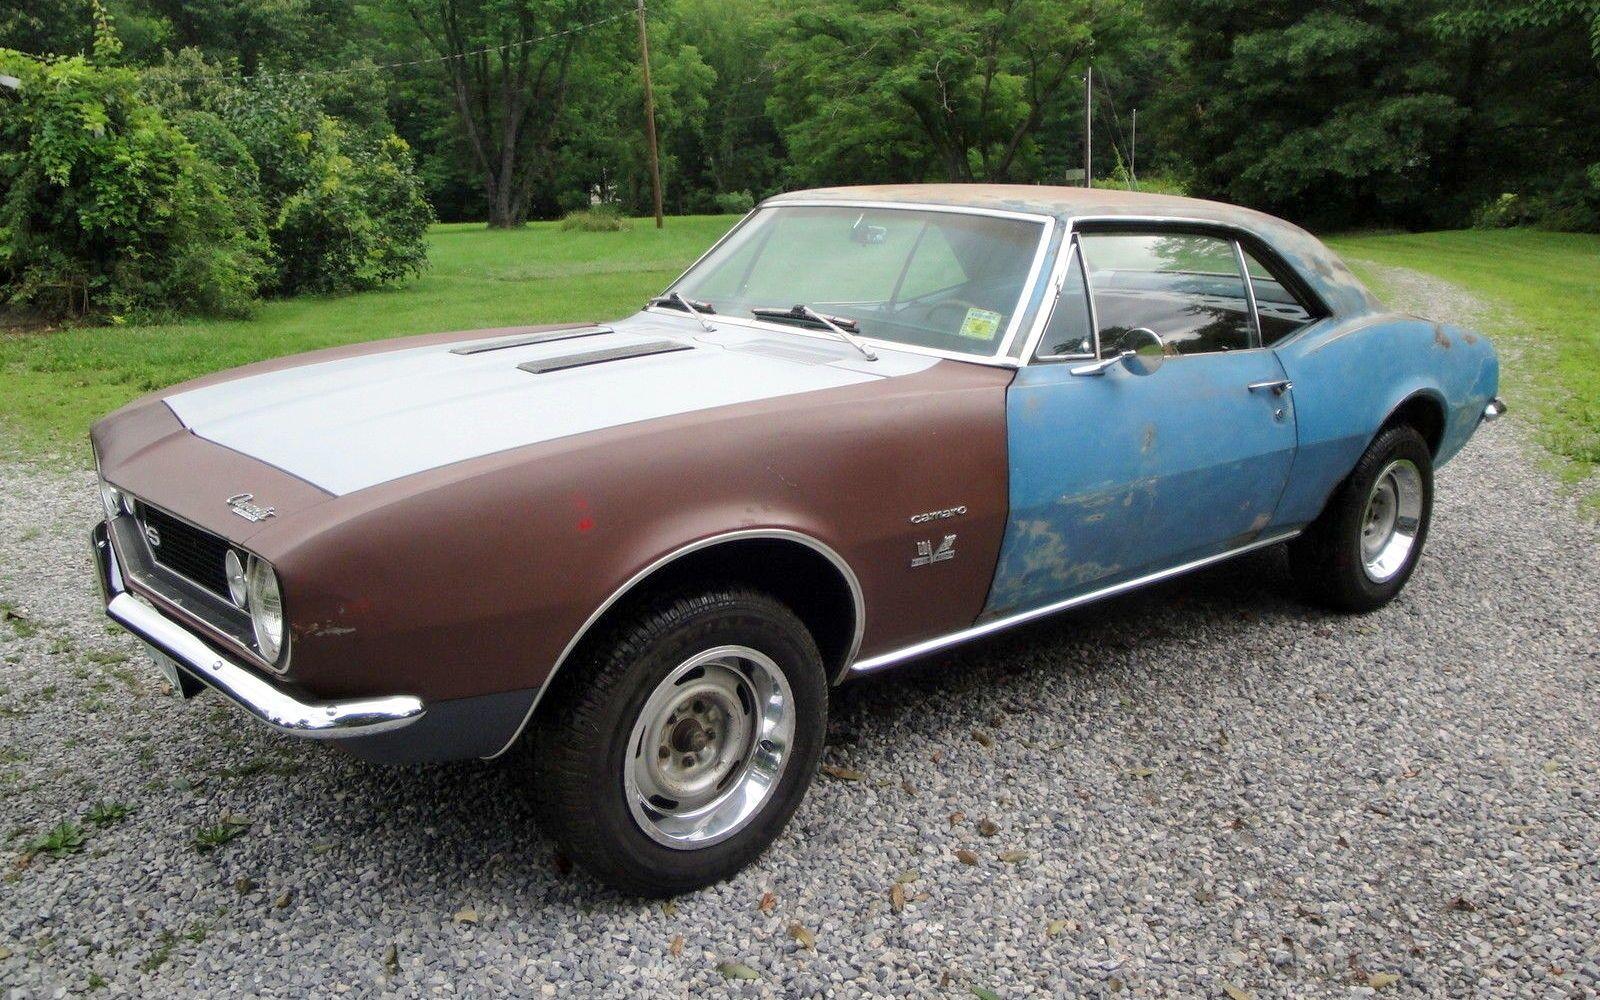 1968 Camaro Project For Sale | Camaro For Sale - Repairable Project ...